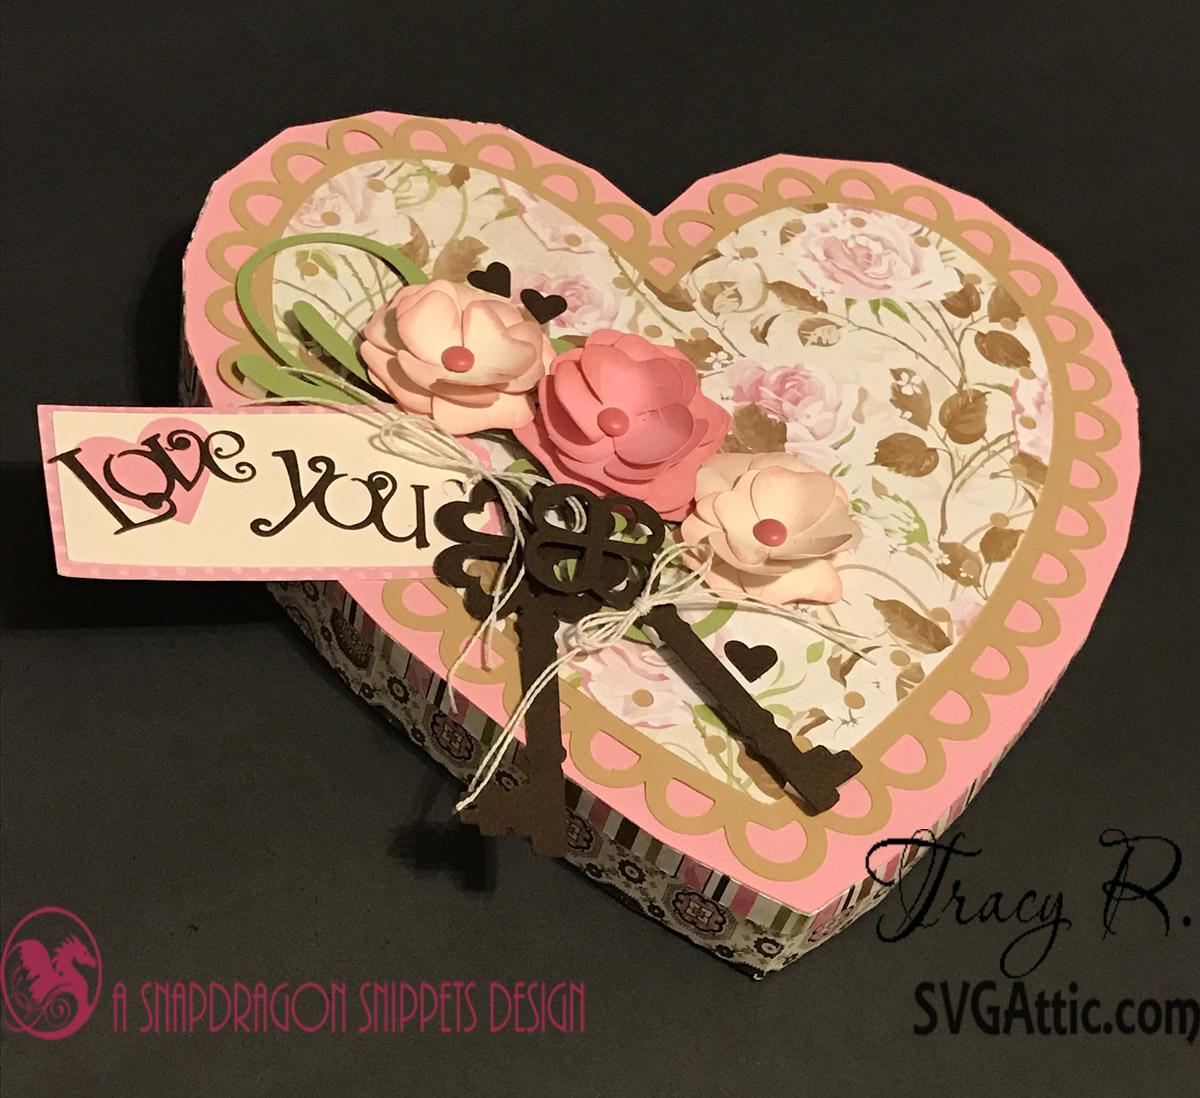 SVG Attic Blog: Valentine Heart Box